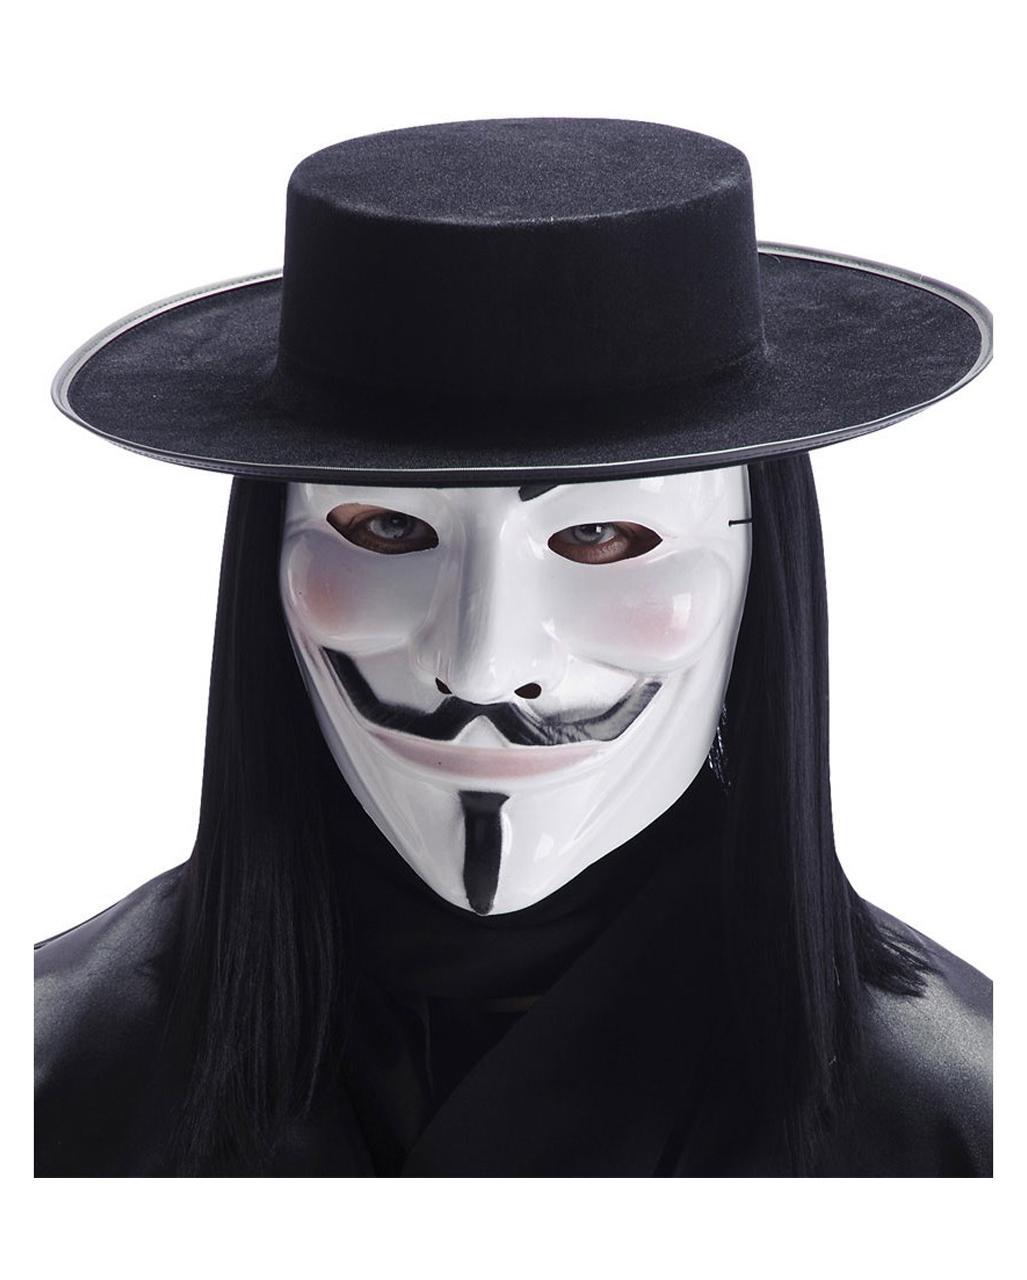 Guy Fawkes Mask ➤ V for Vendetta Mask purchase | horror-shop.com